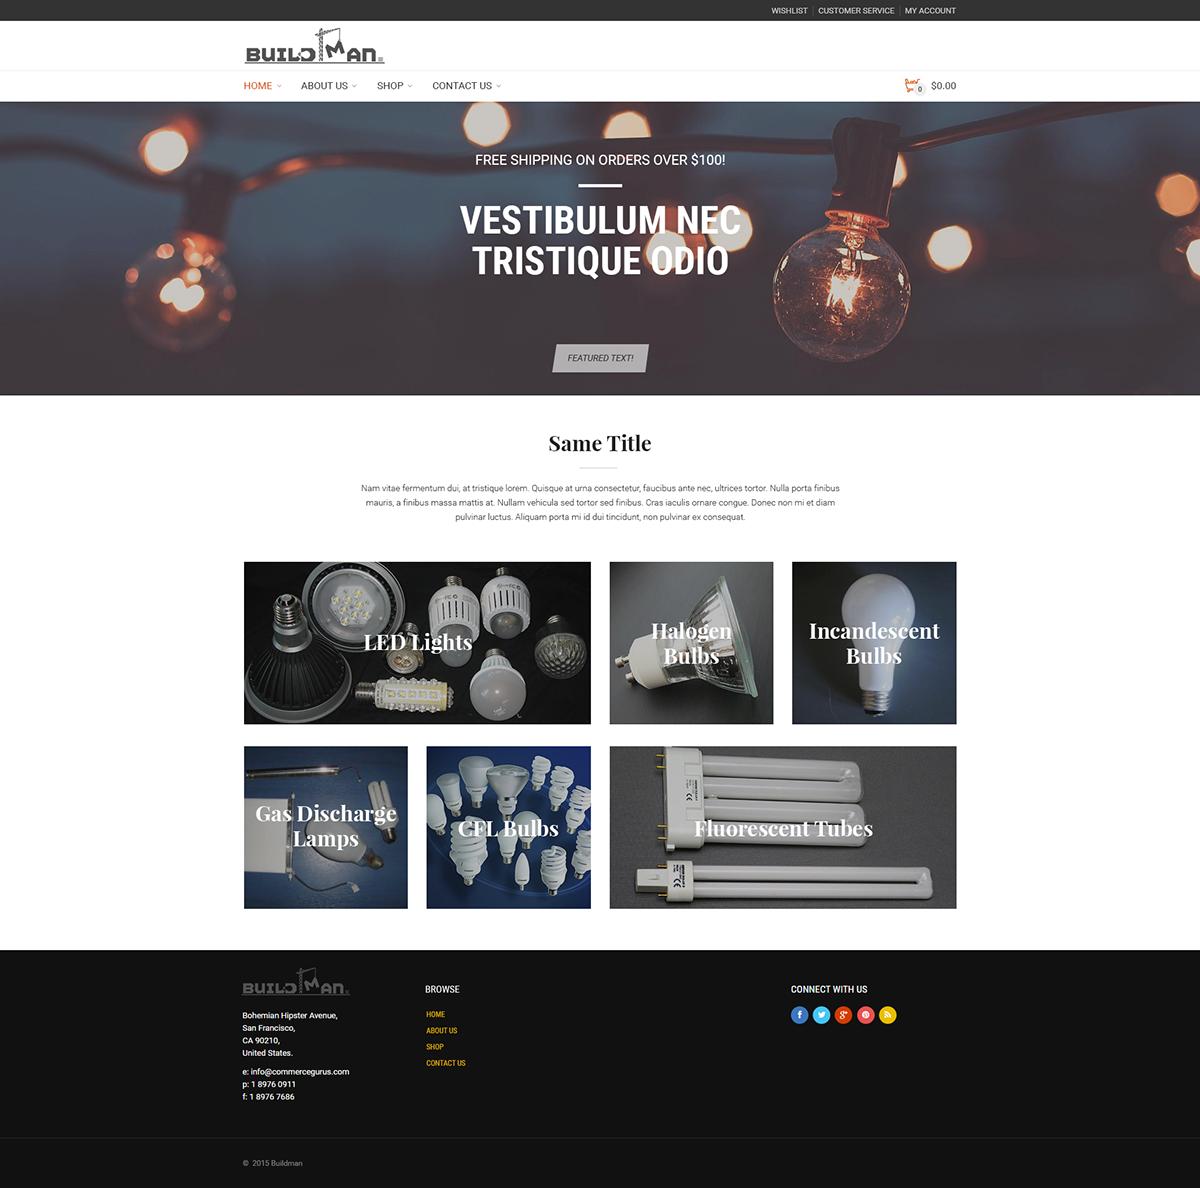 design Web Online shop online store homepage buildman lights